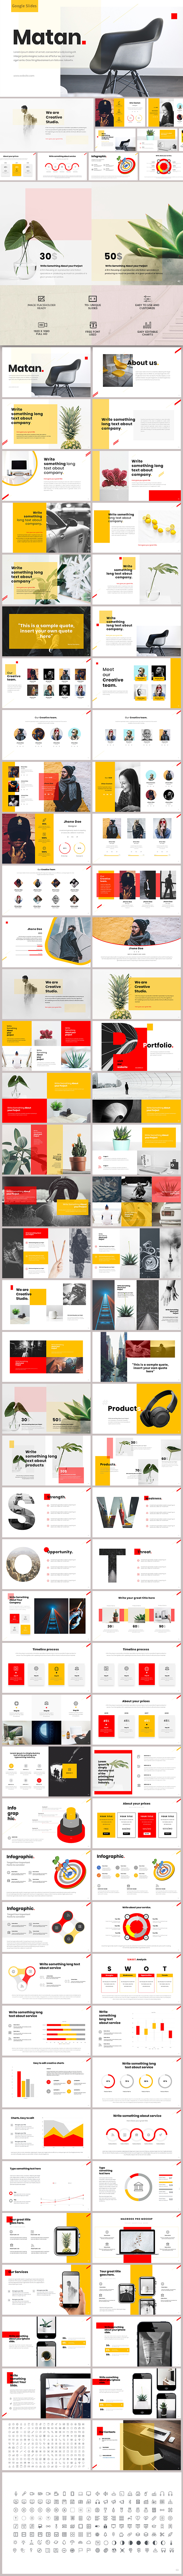 Matan Google Slides - Google Slides Presentation Templates